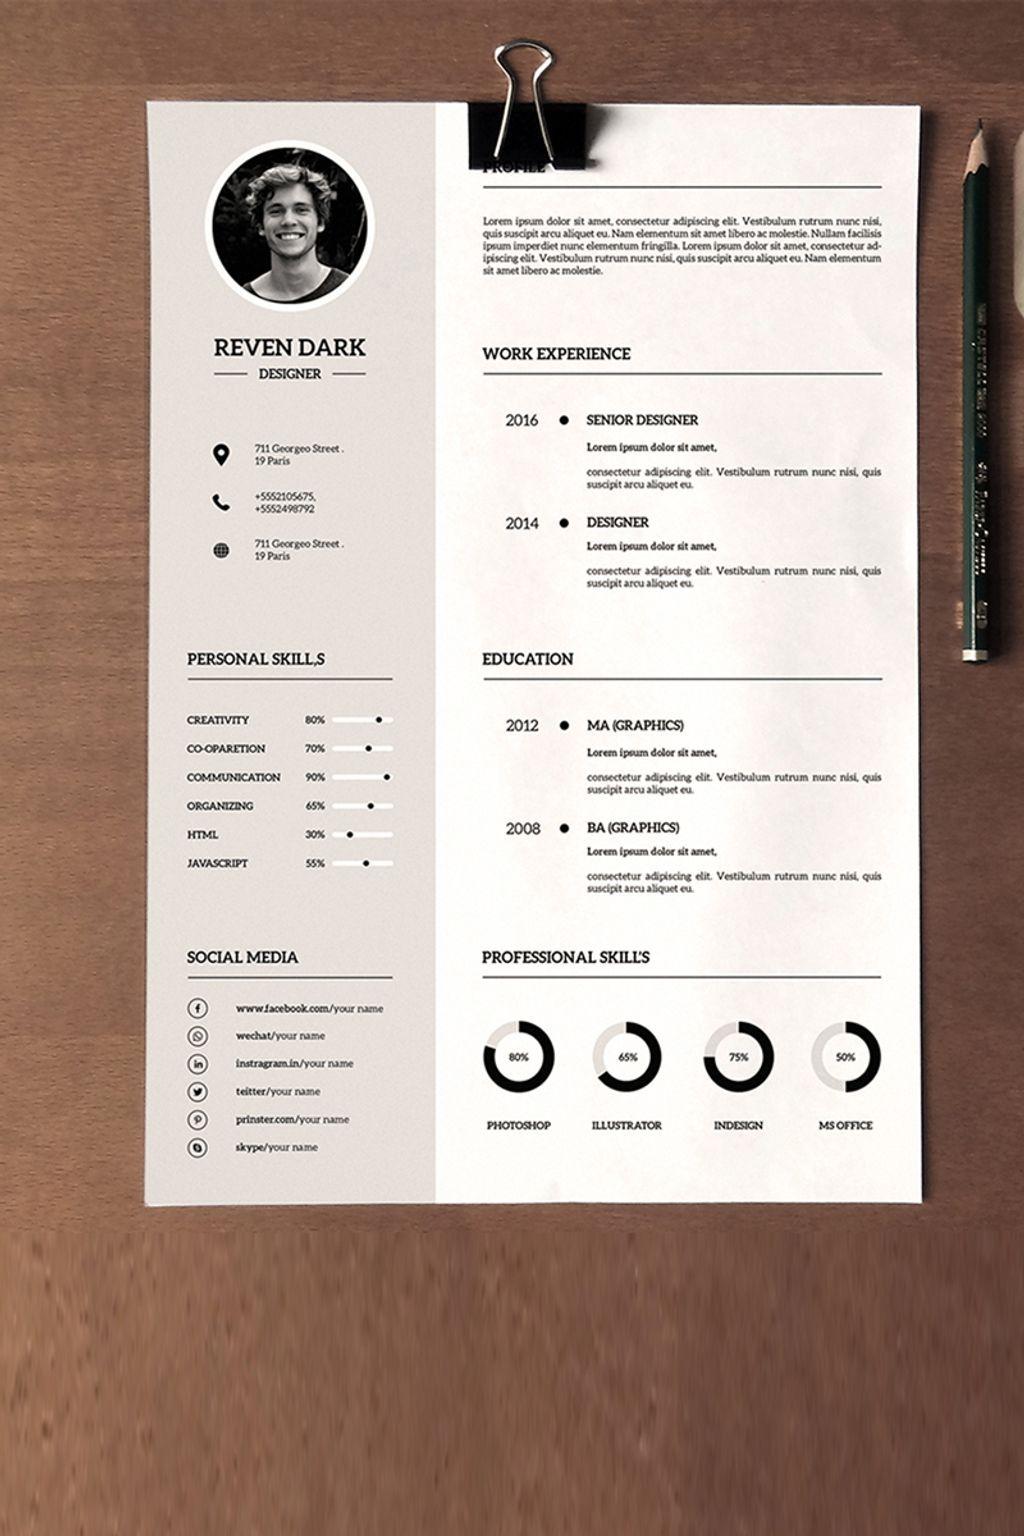 reven dark clean resume template